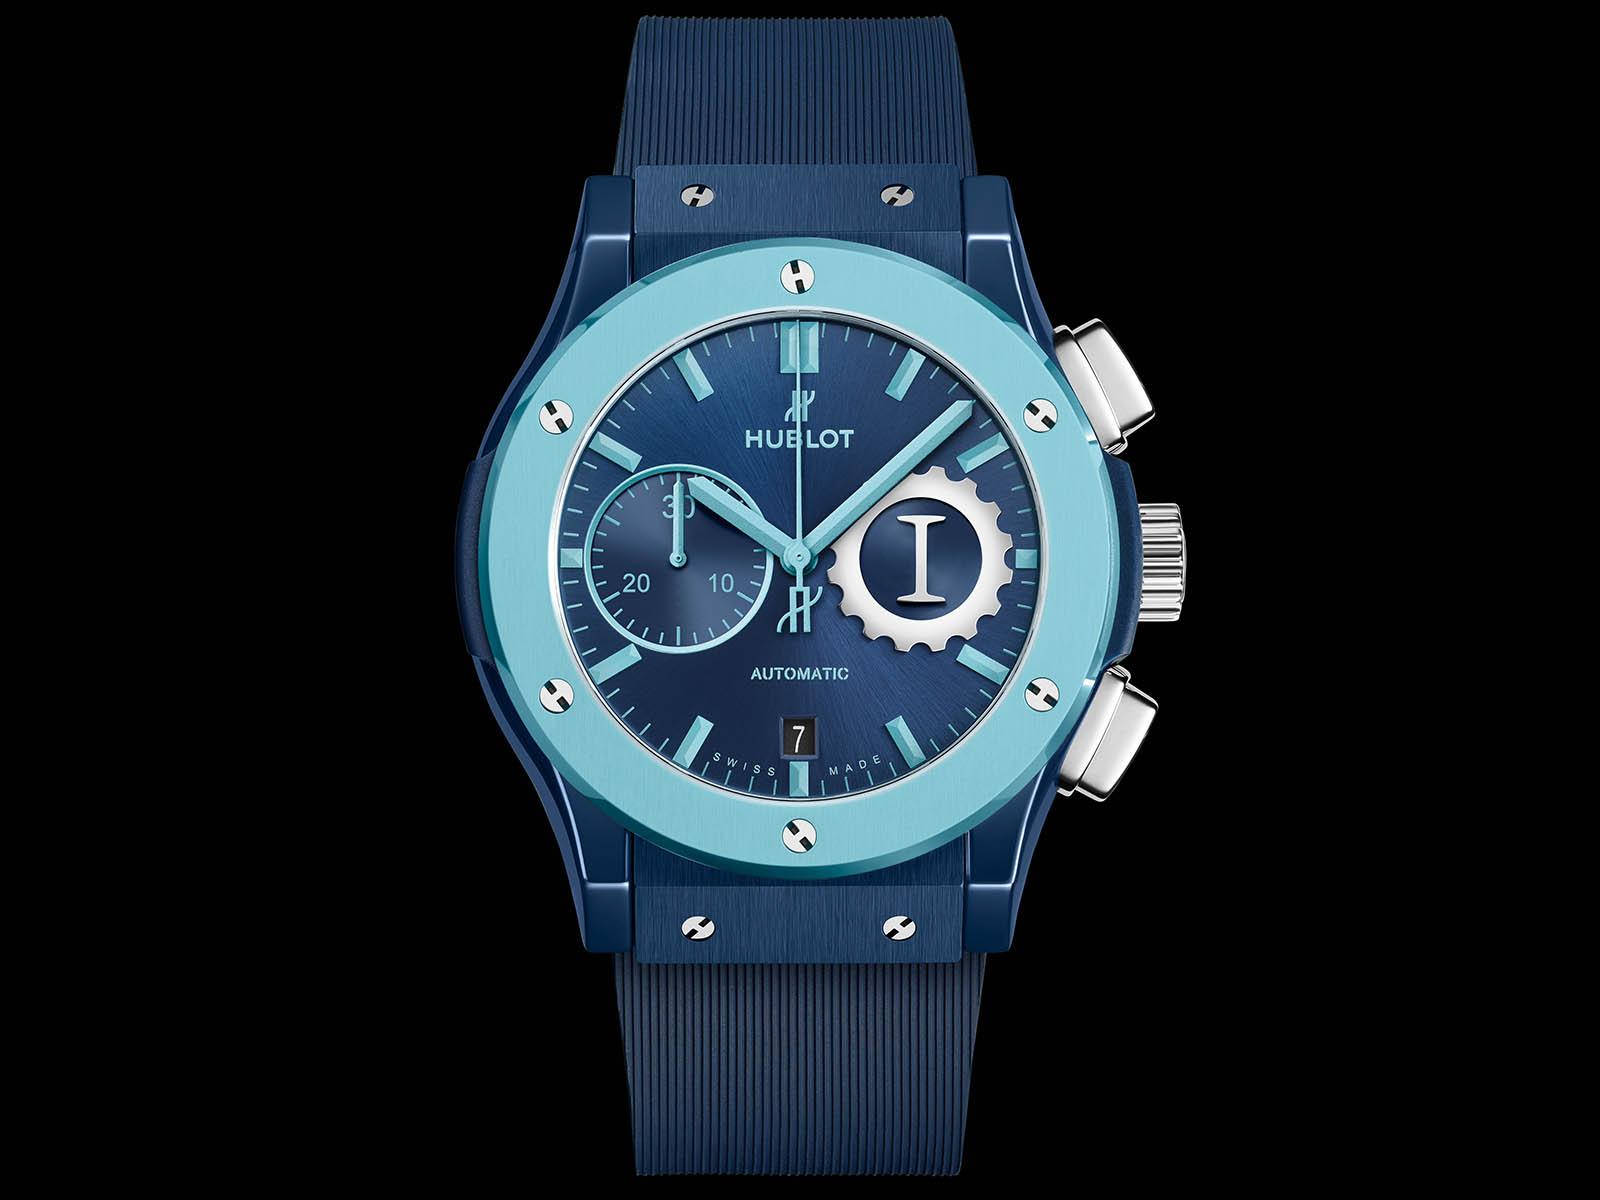 hublot-classic-fusion-chronograph-garage-italia-521-ex-7170-rx-git19-5.jpg